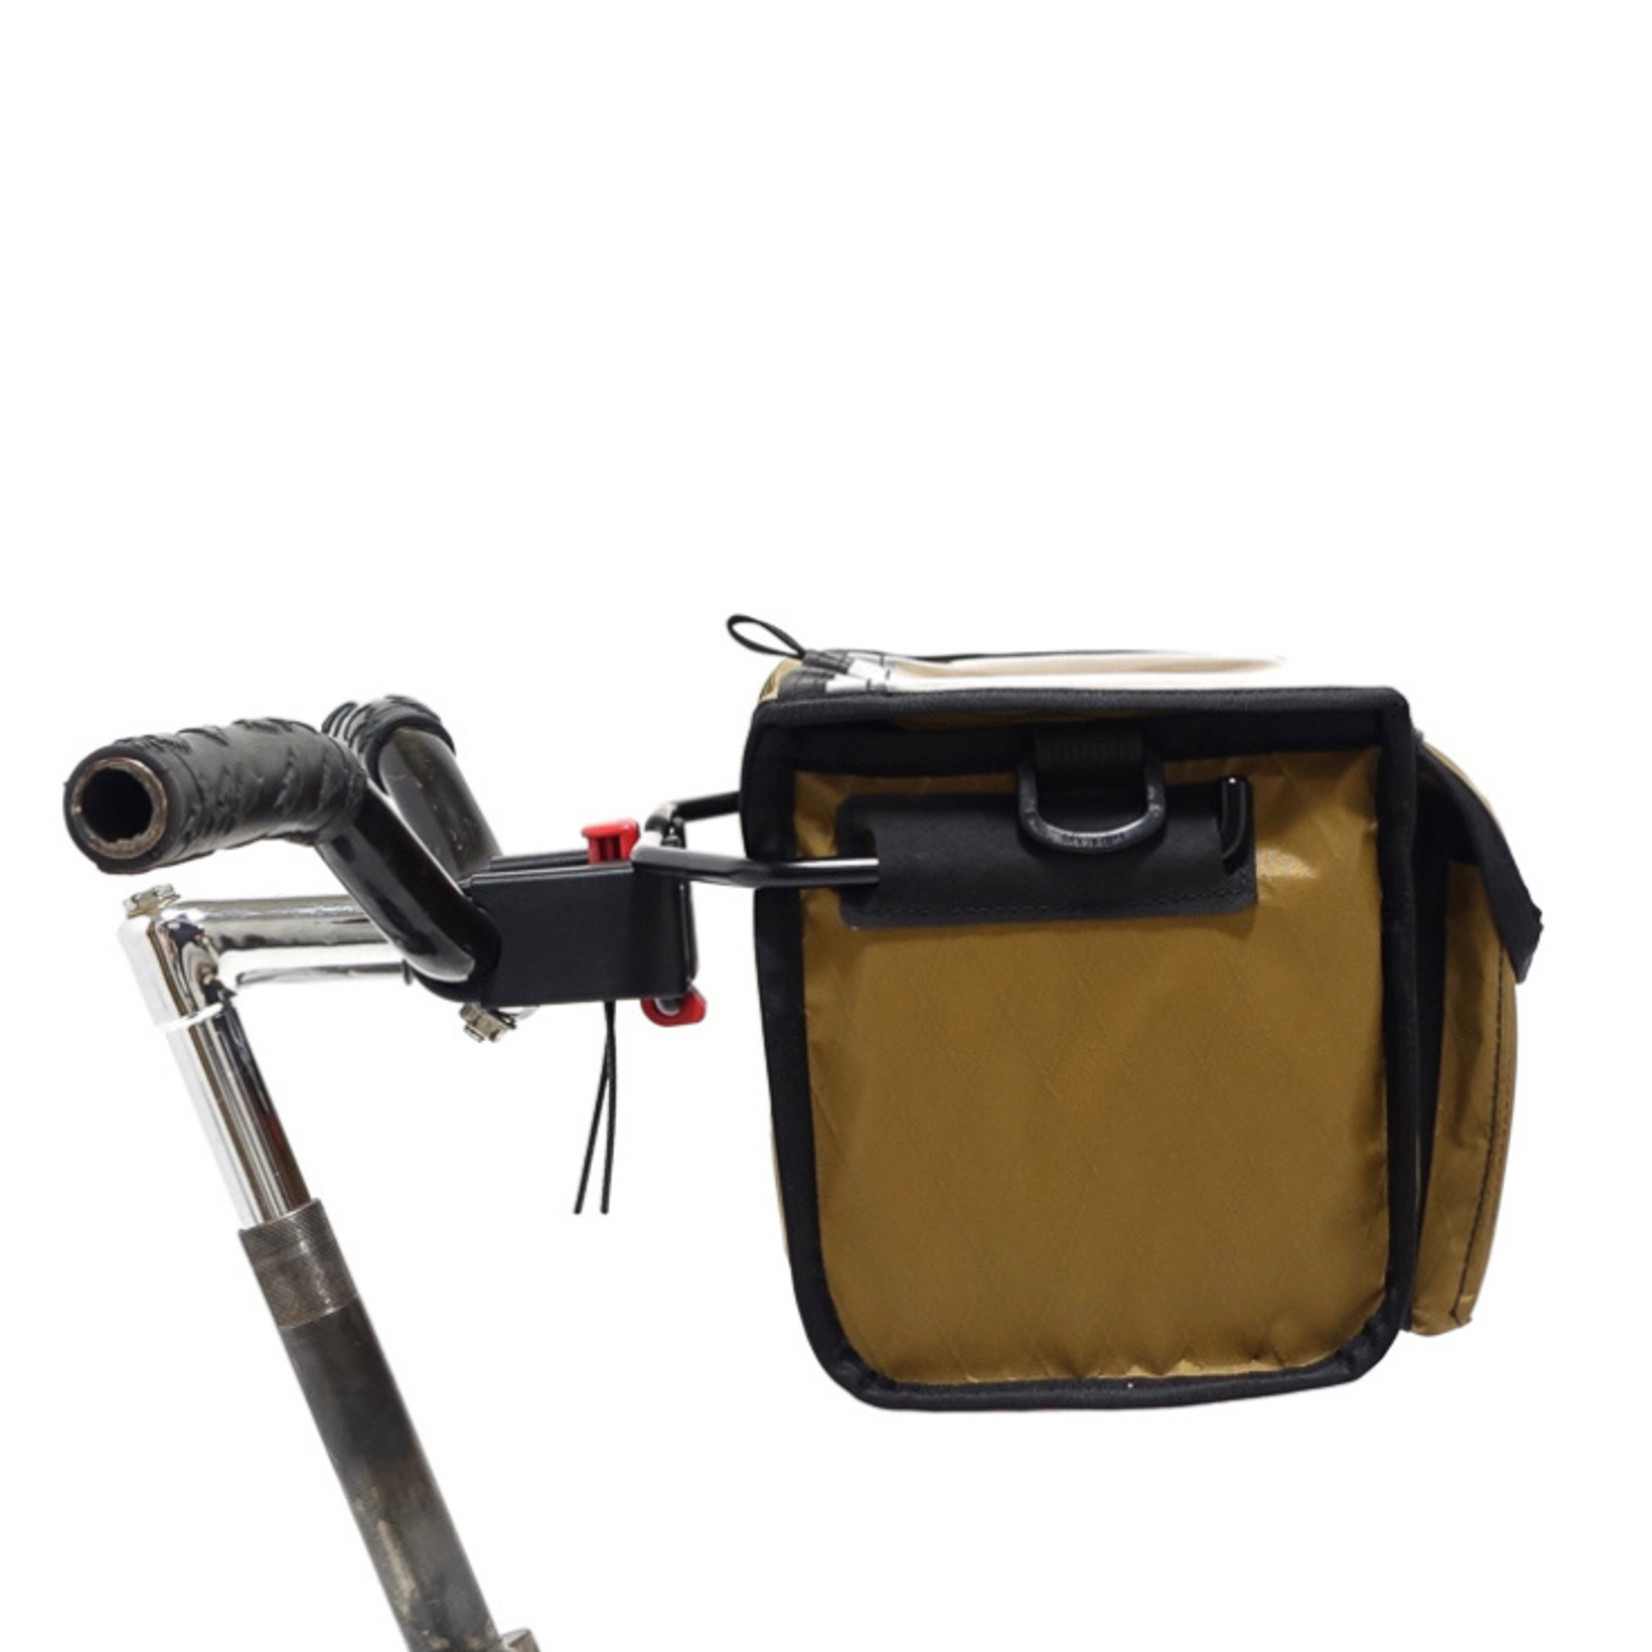 Swift Industries Swift Industries Paloma Handlebar Bag